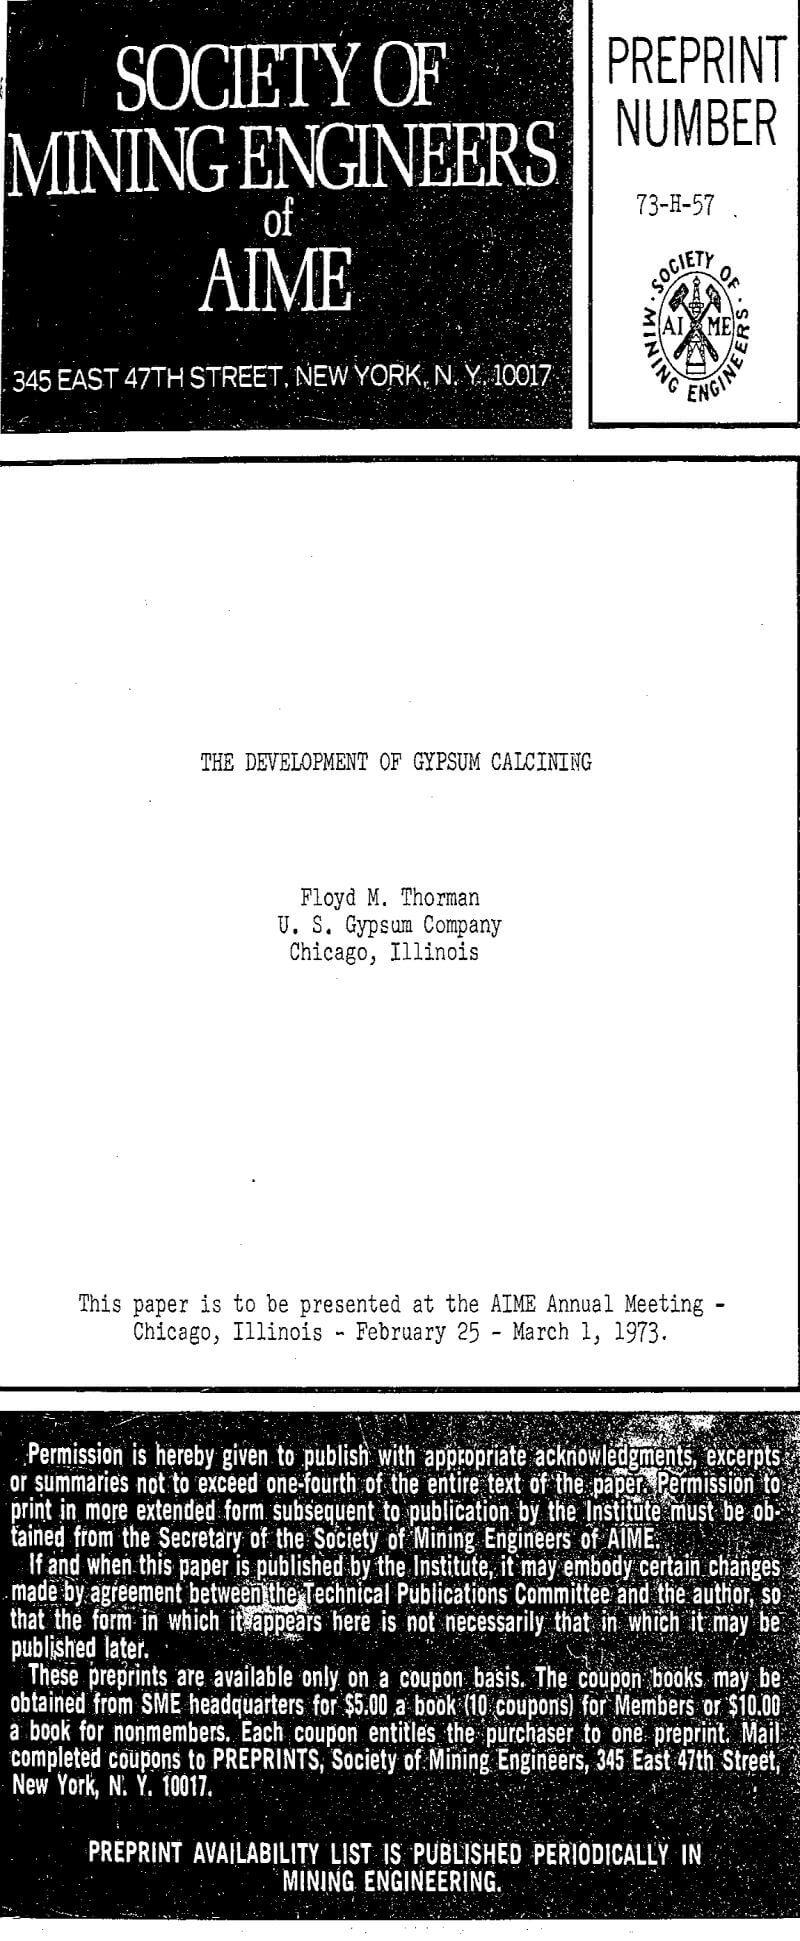 the development of gypsum calcining